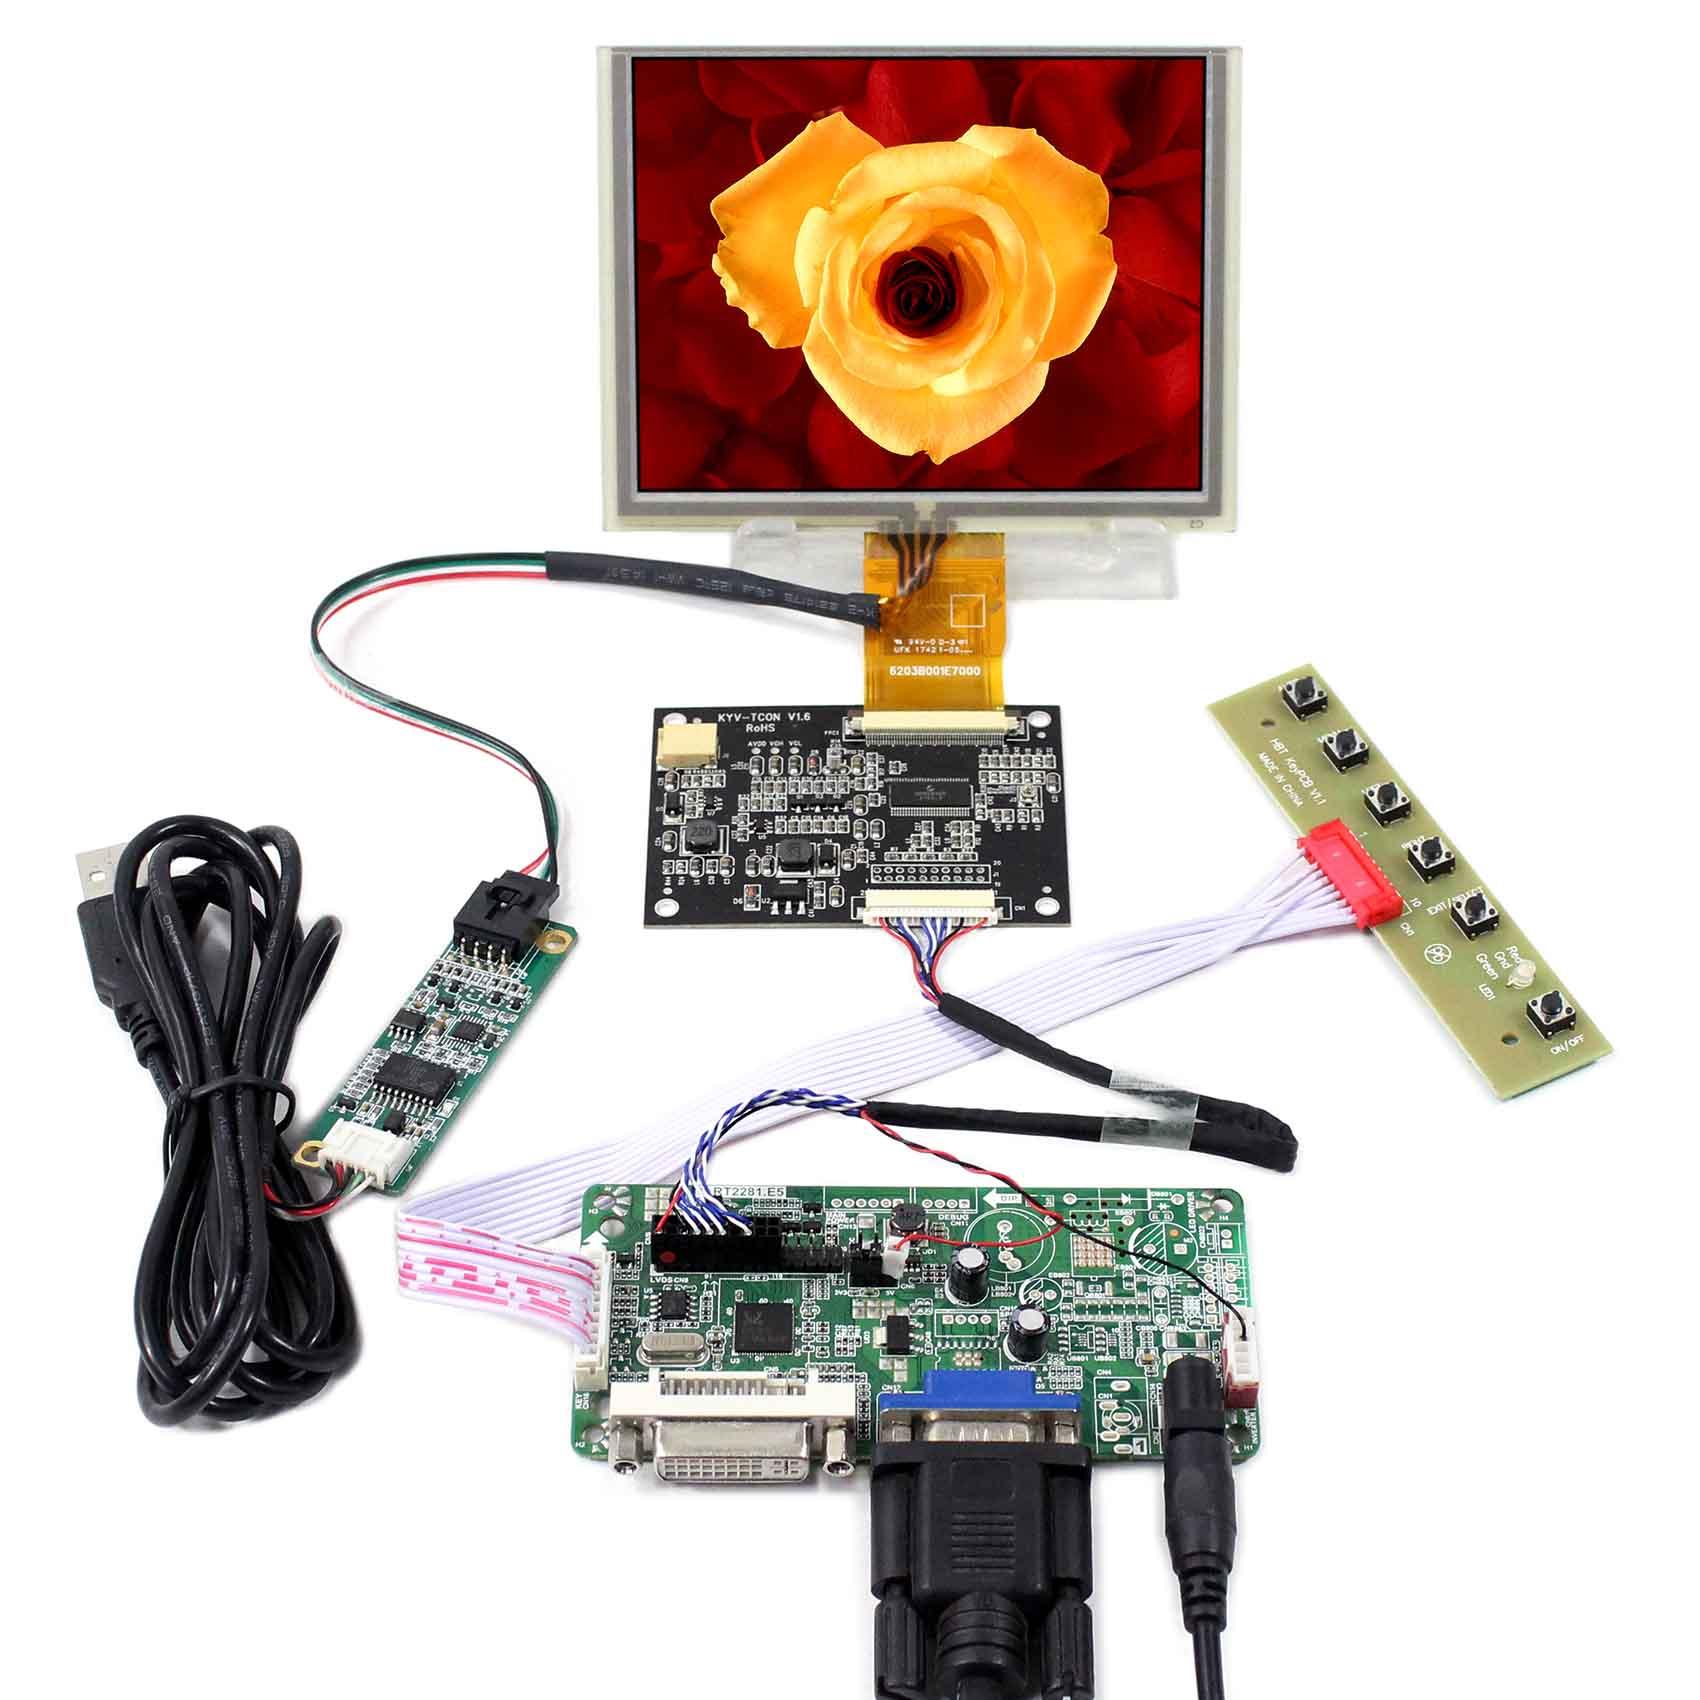 VGA DVI LCD Controller Board 5-inch touch screen ZJ050NA-08C 5inch 640X480  LCD ScreenVGA DVI LCD Controller Board 5-inch touch screen ZJ050NA-08C 5inch 640X480  LCD Screen